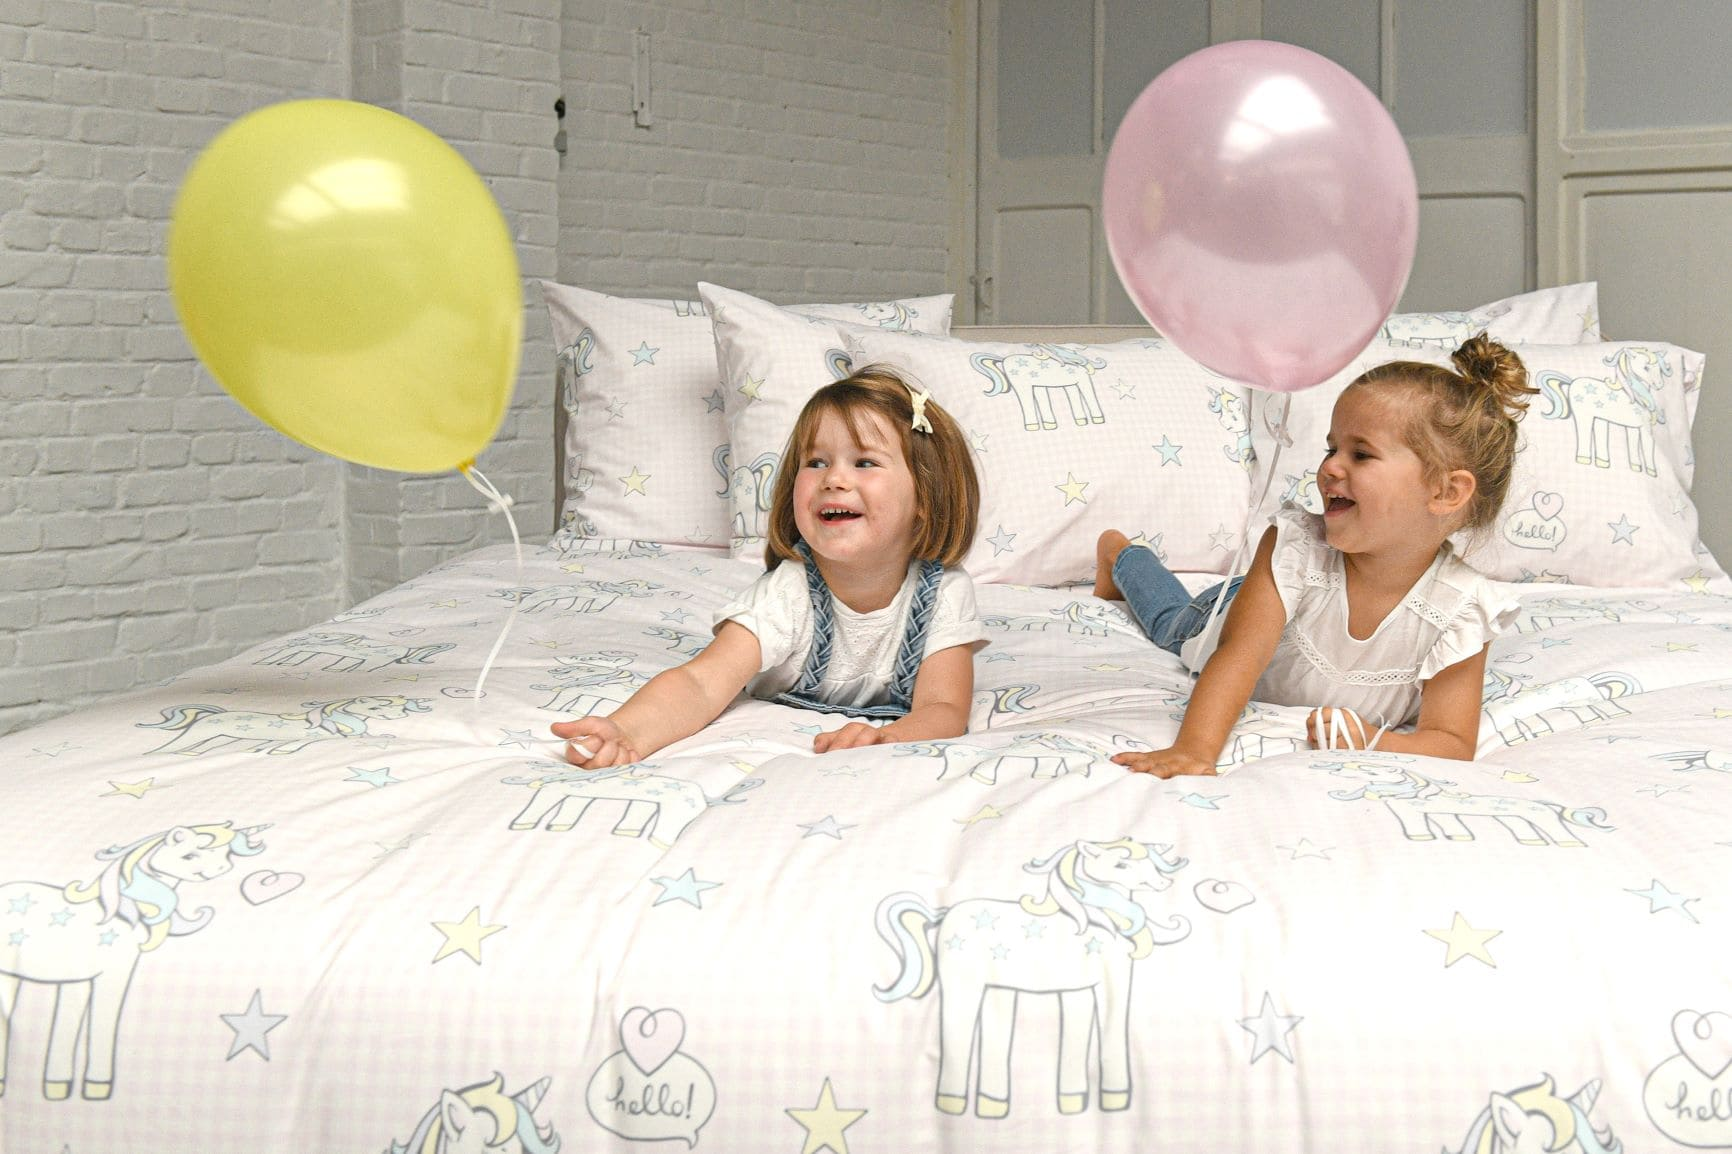 Kinderdekbedovertrek Unicorn - Passion Home Linen